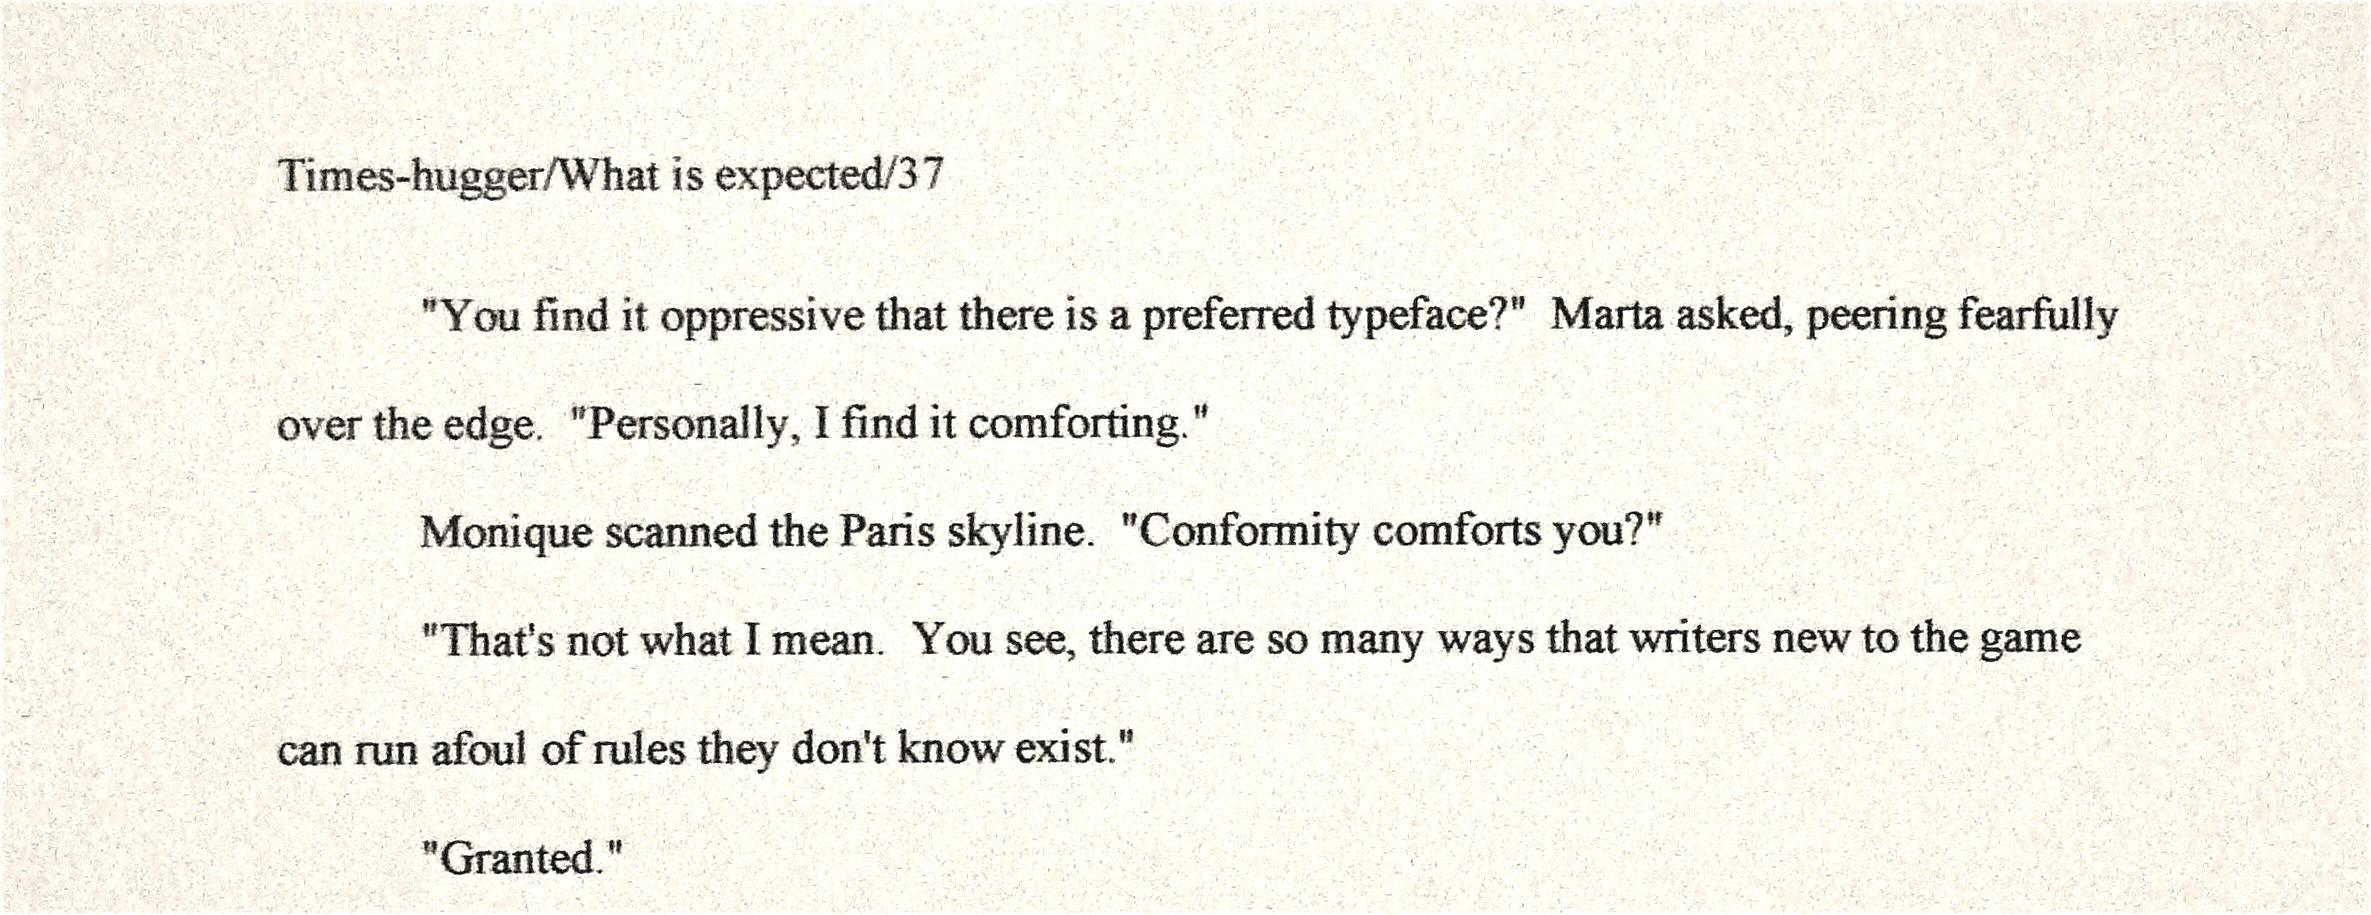 Separating essay into paragraphs